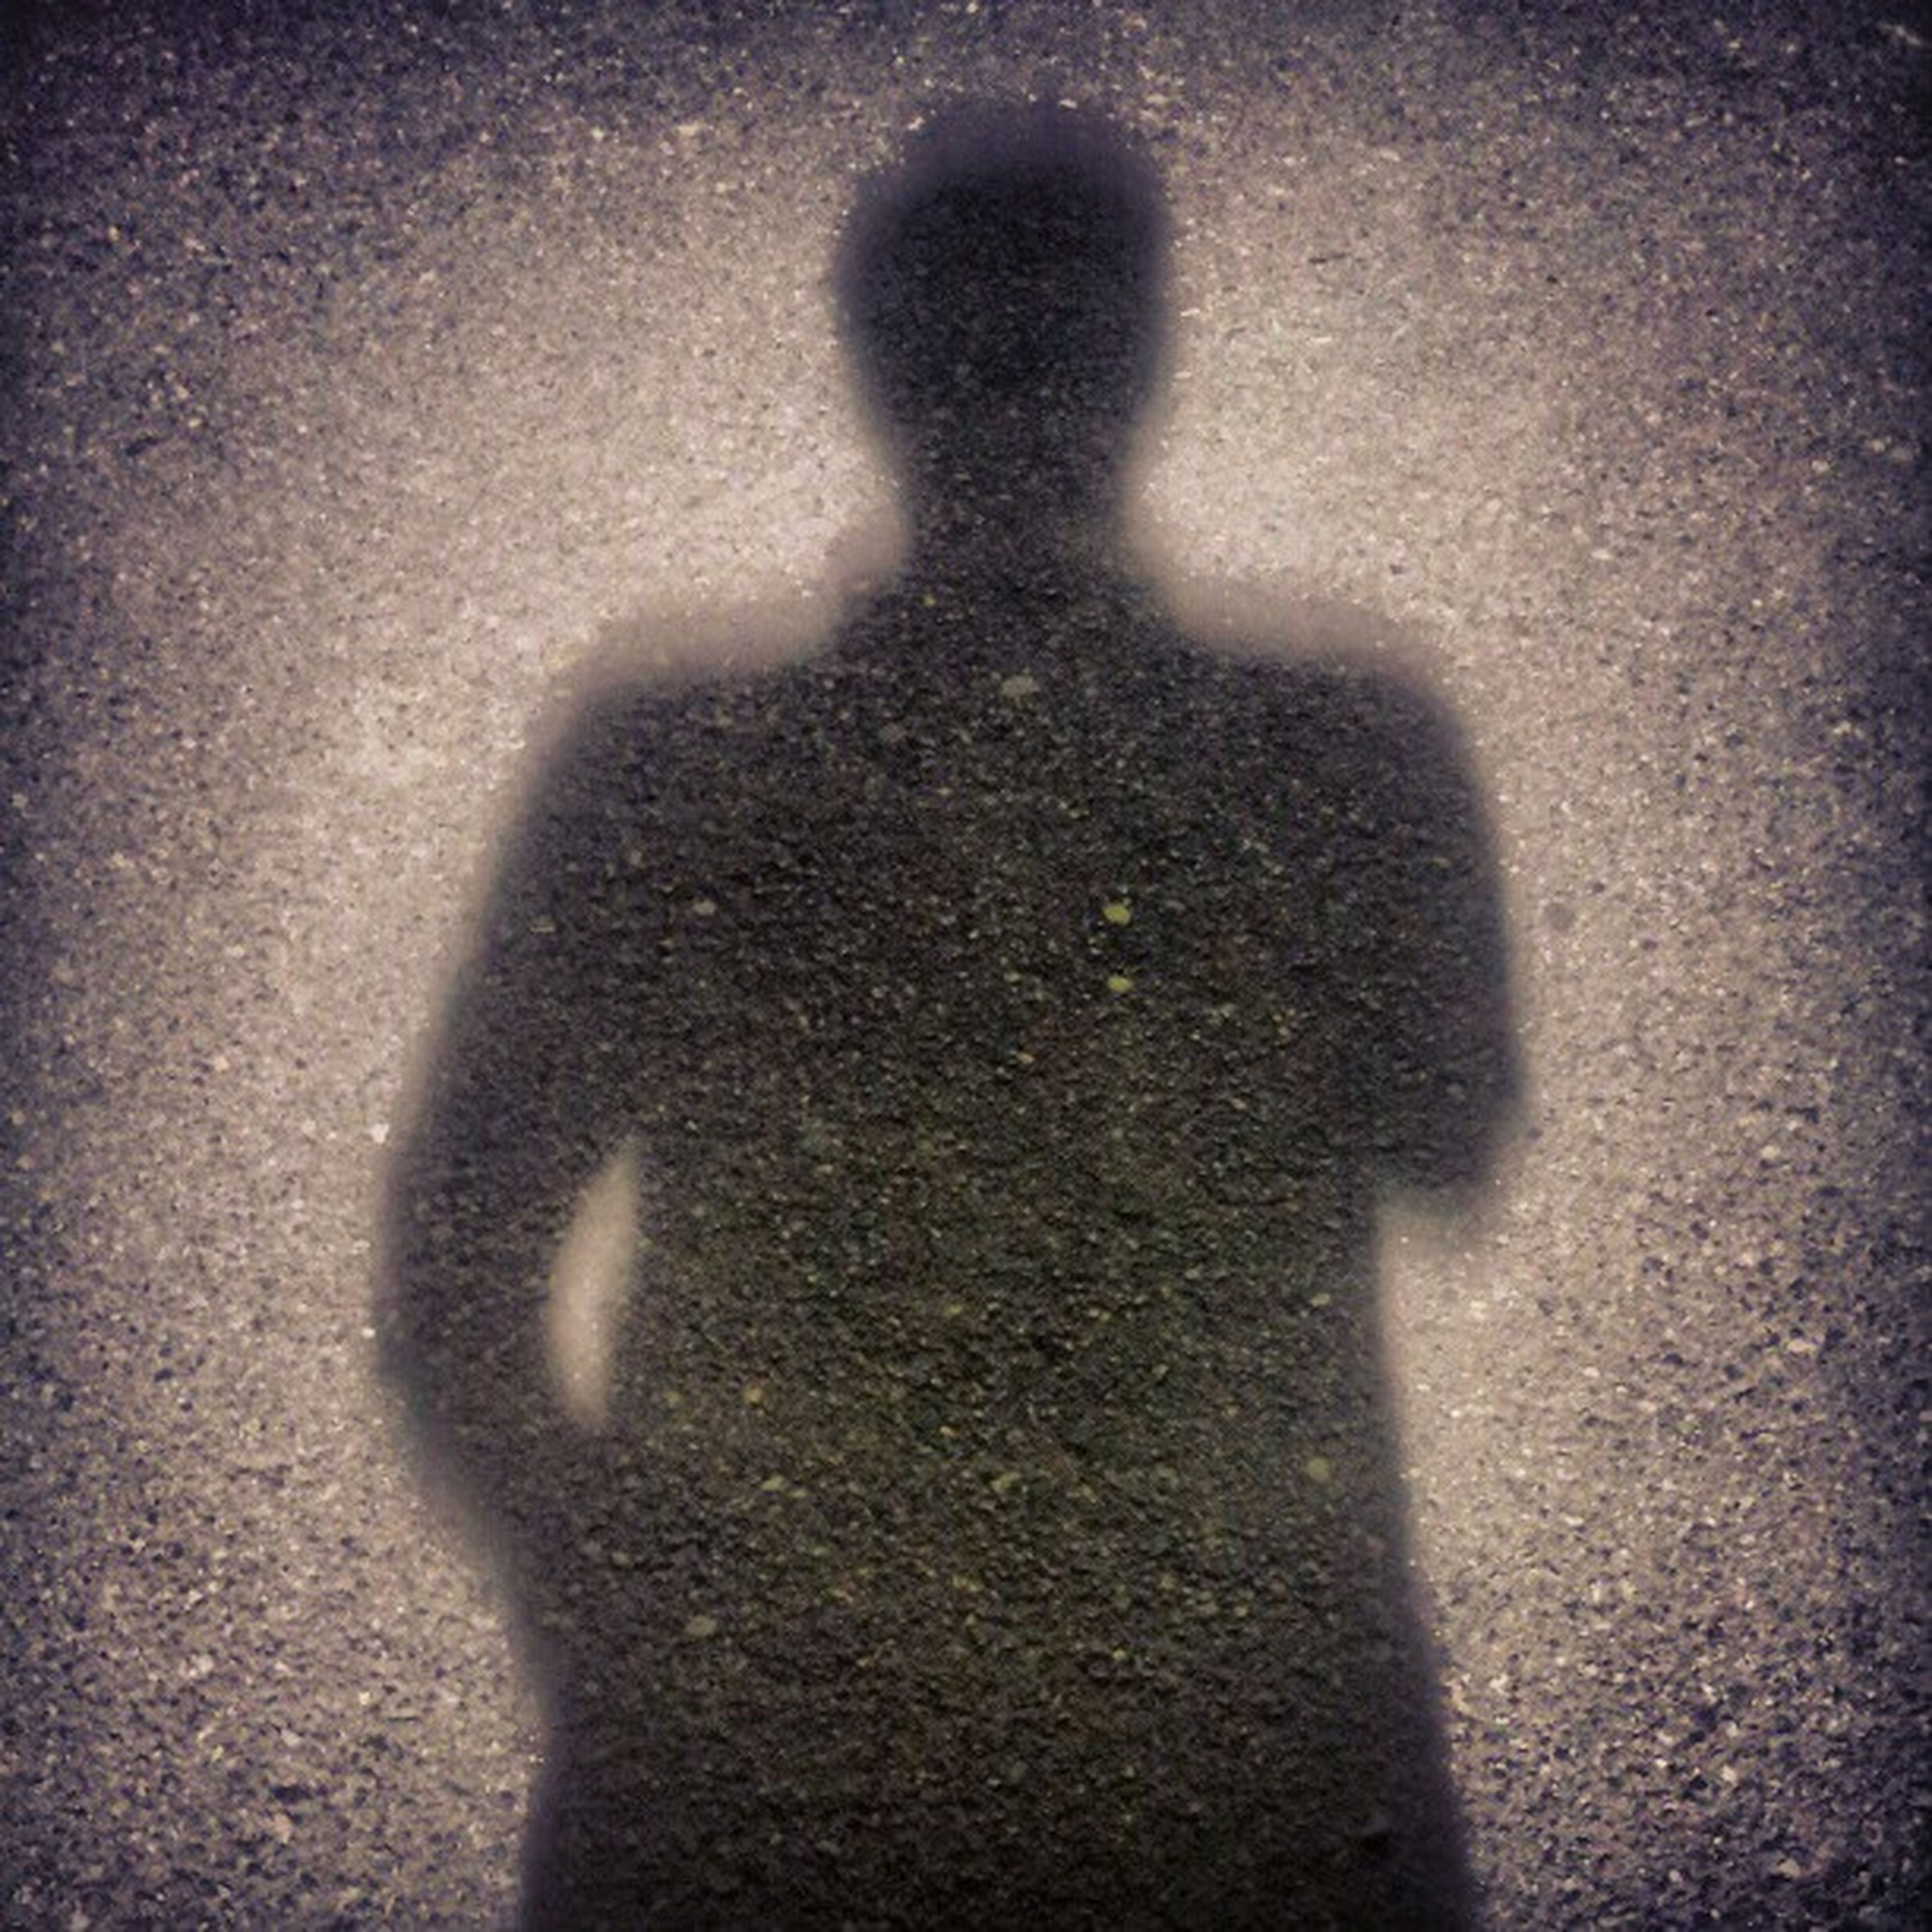 My shadow سایه My_shadow سایه_من پارک Me Playground Shadow Park من